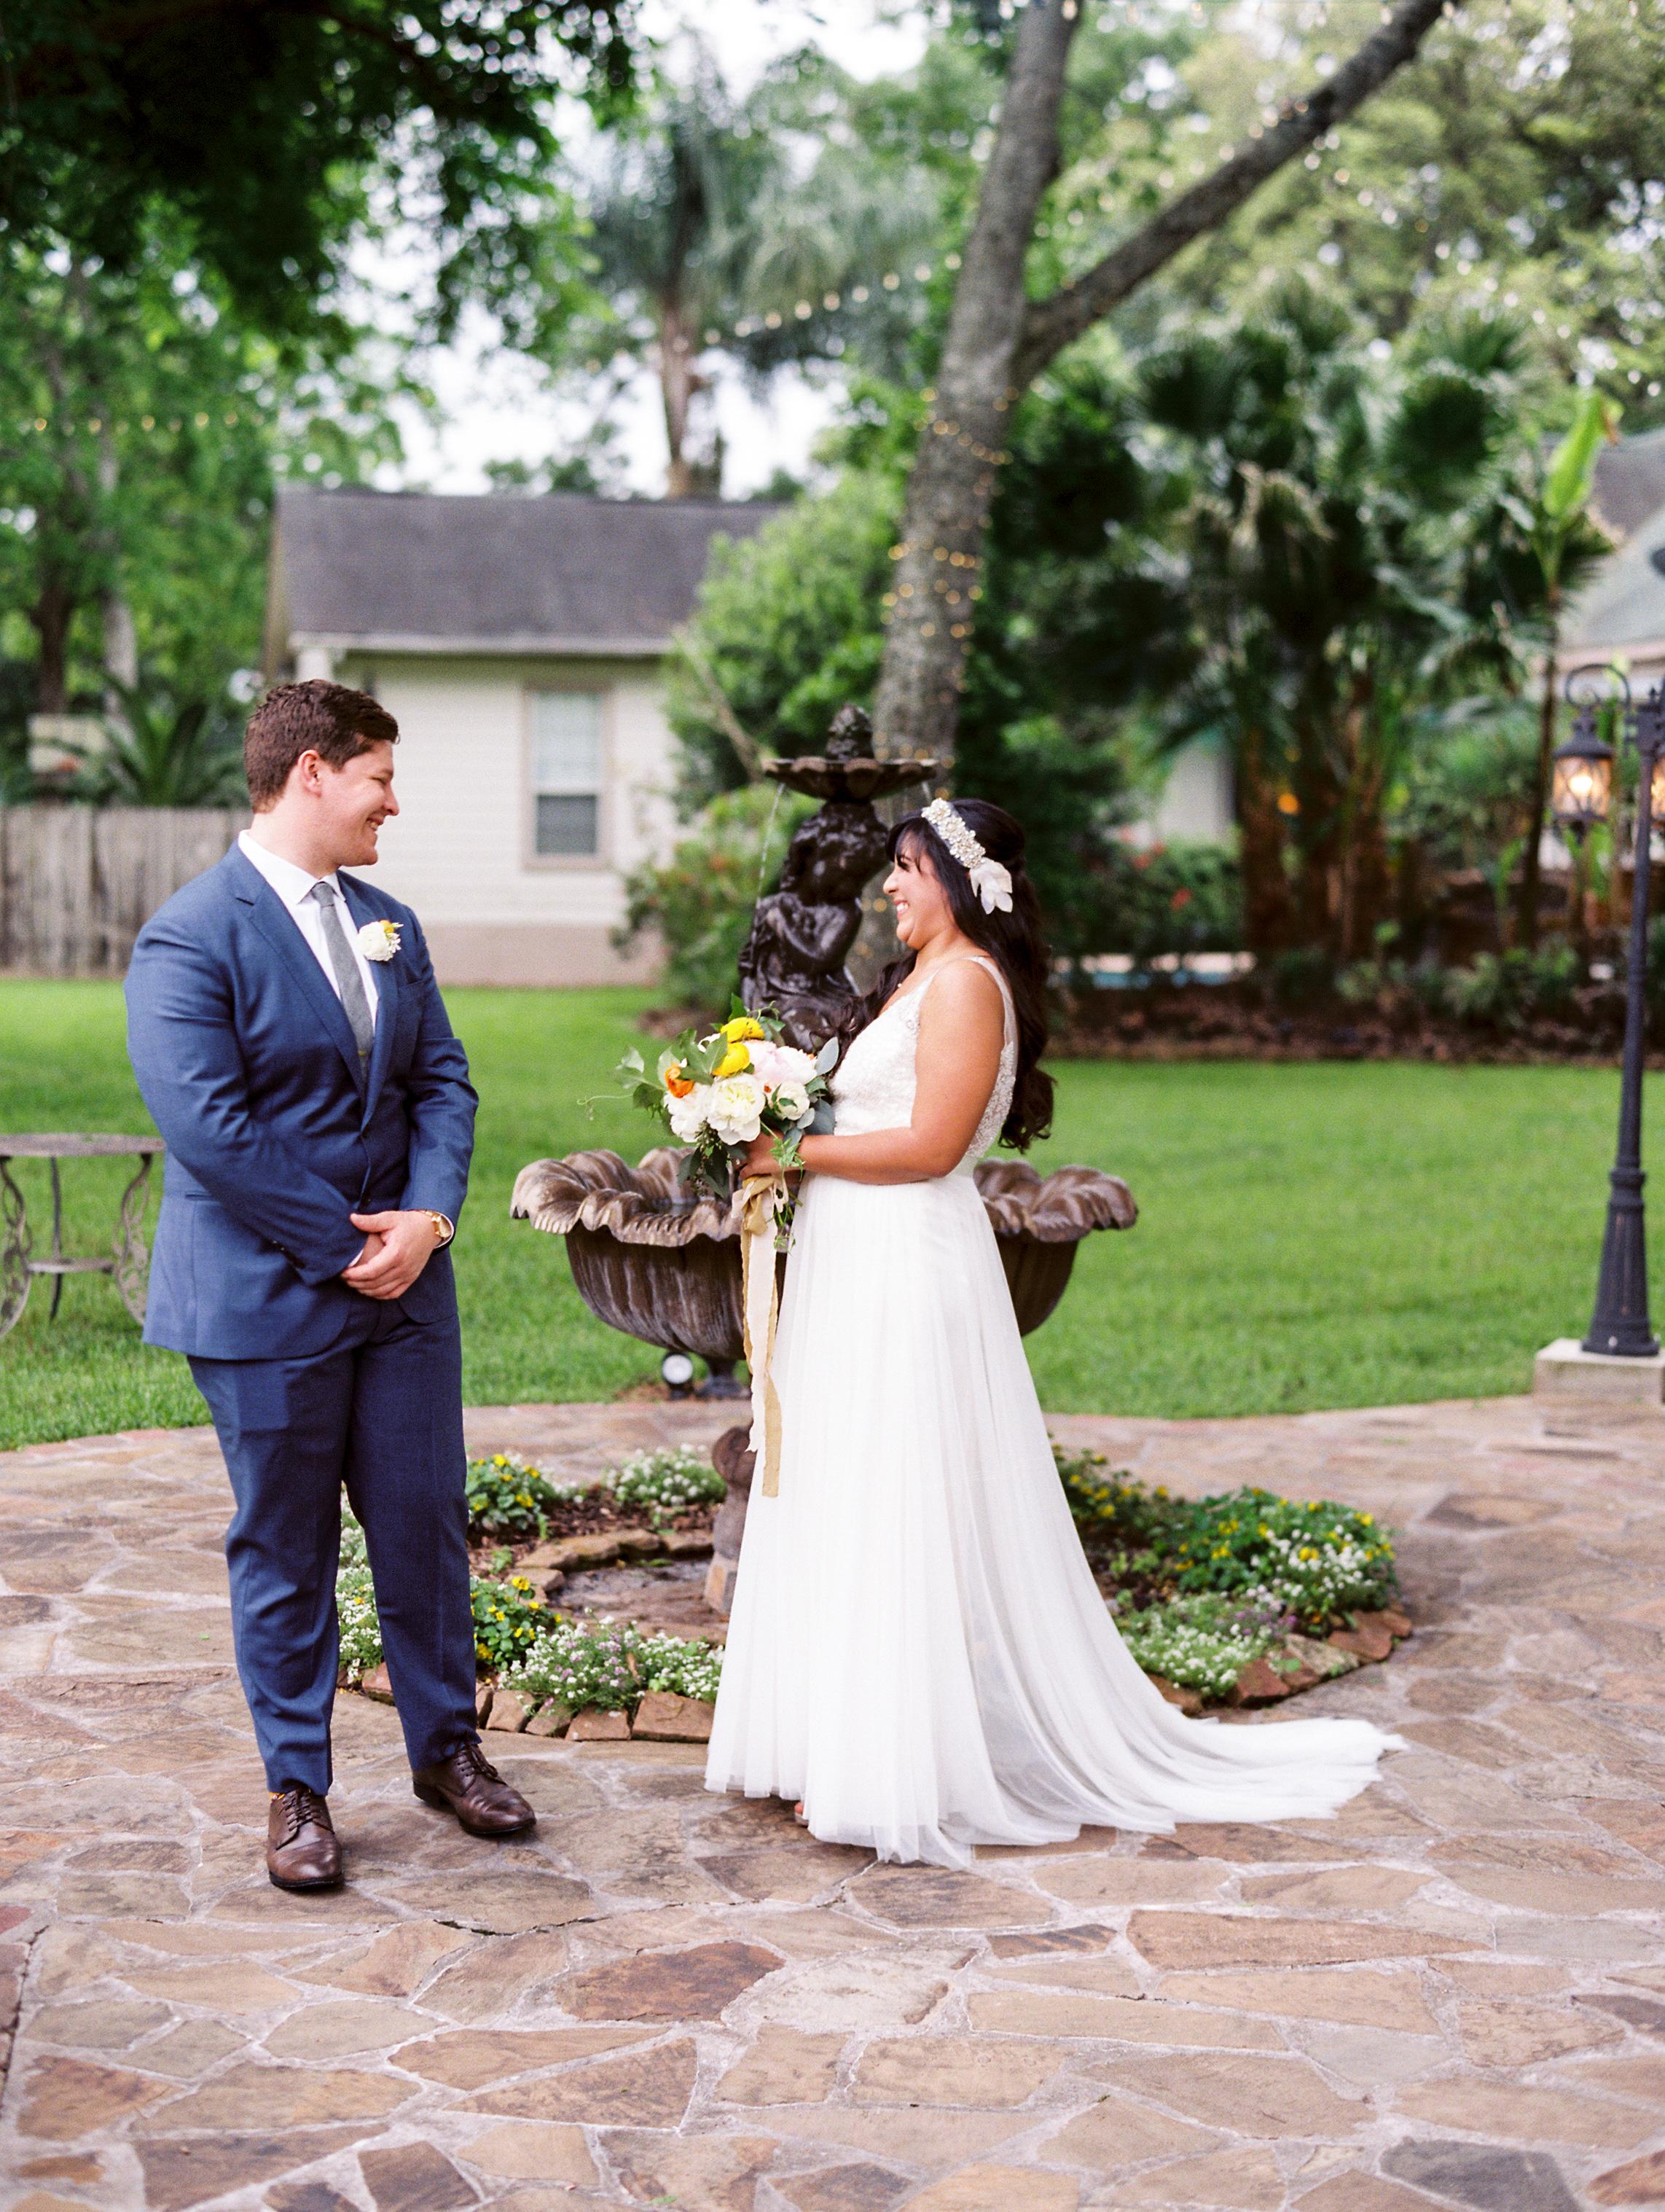 Dana Fernandez Photography Houston Texas Destination Photographer Film Ruffled Blog Wedding Bridal First Look Featured Photography -34.jpg